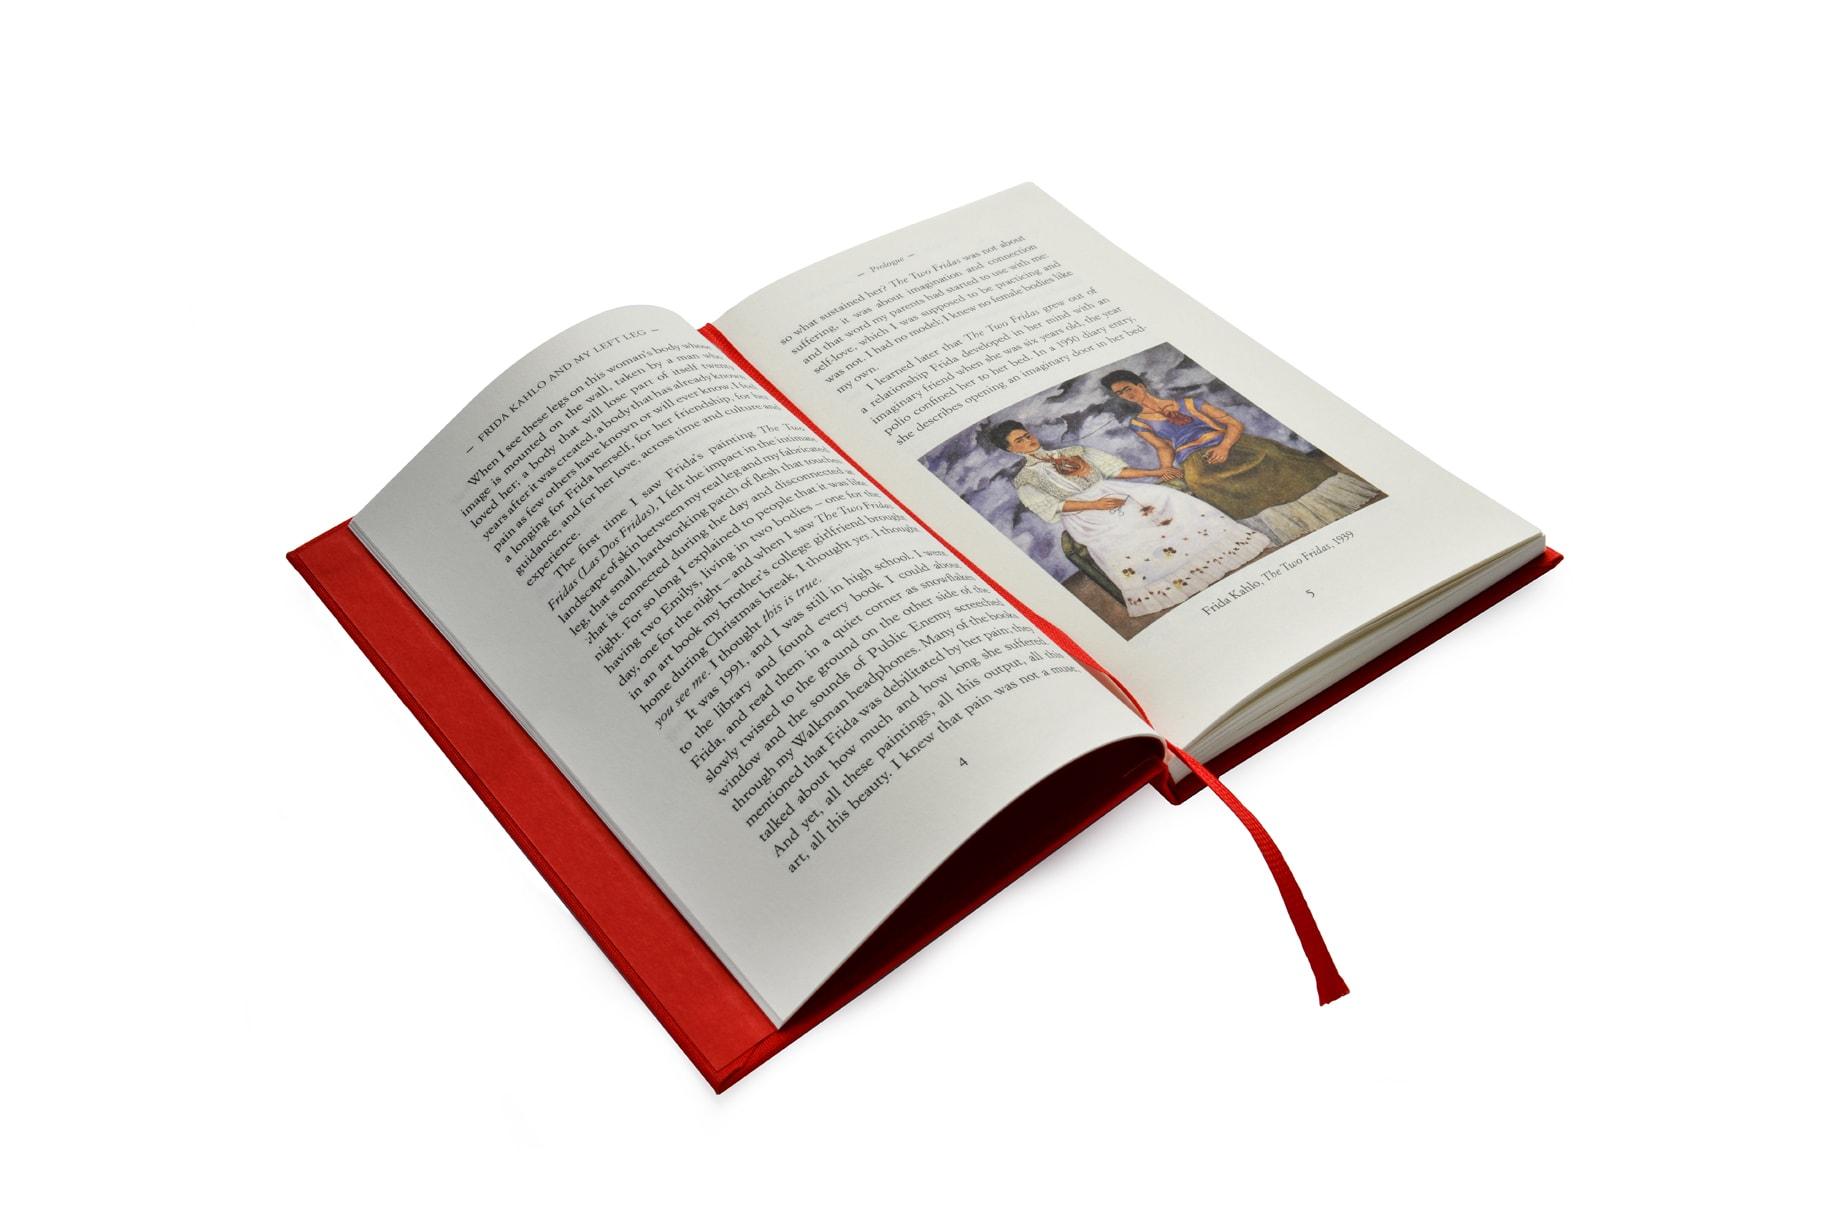 FKML-3-single-book-INSIDE-threequarters-MR